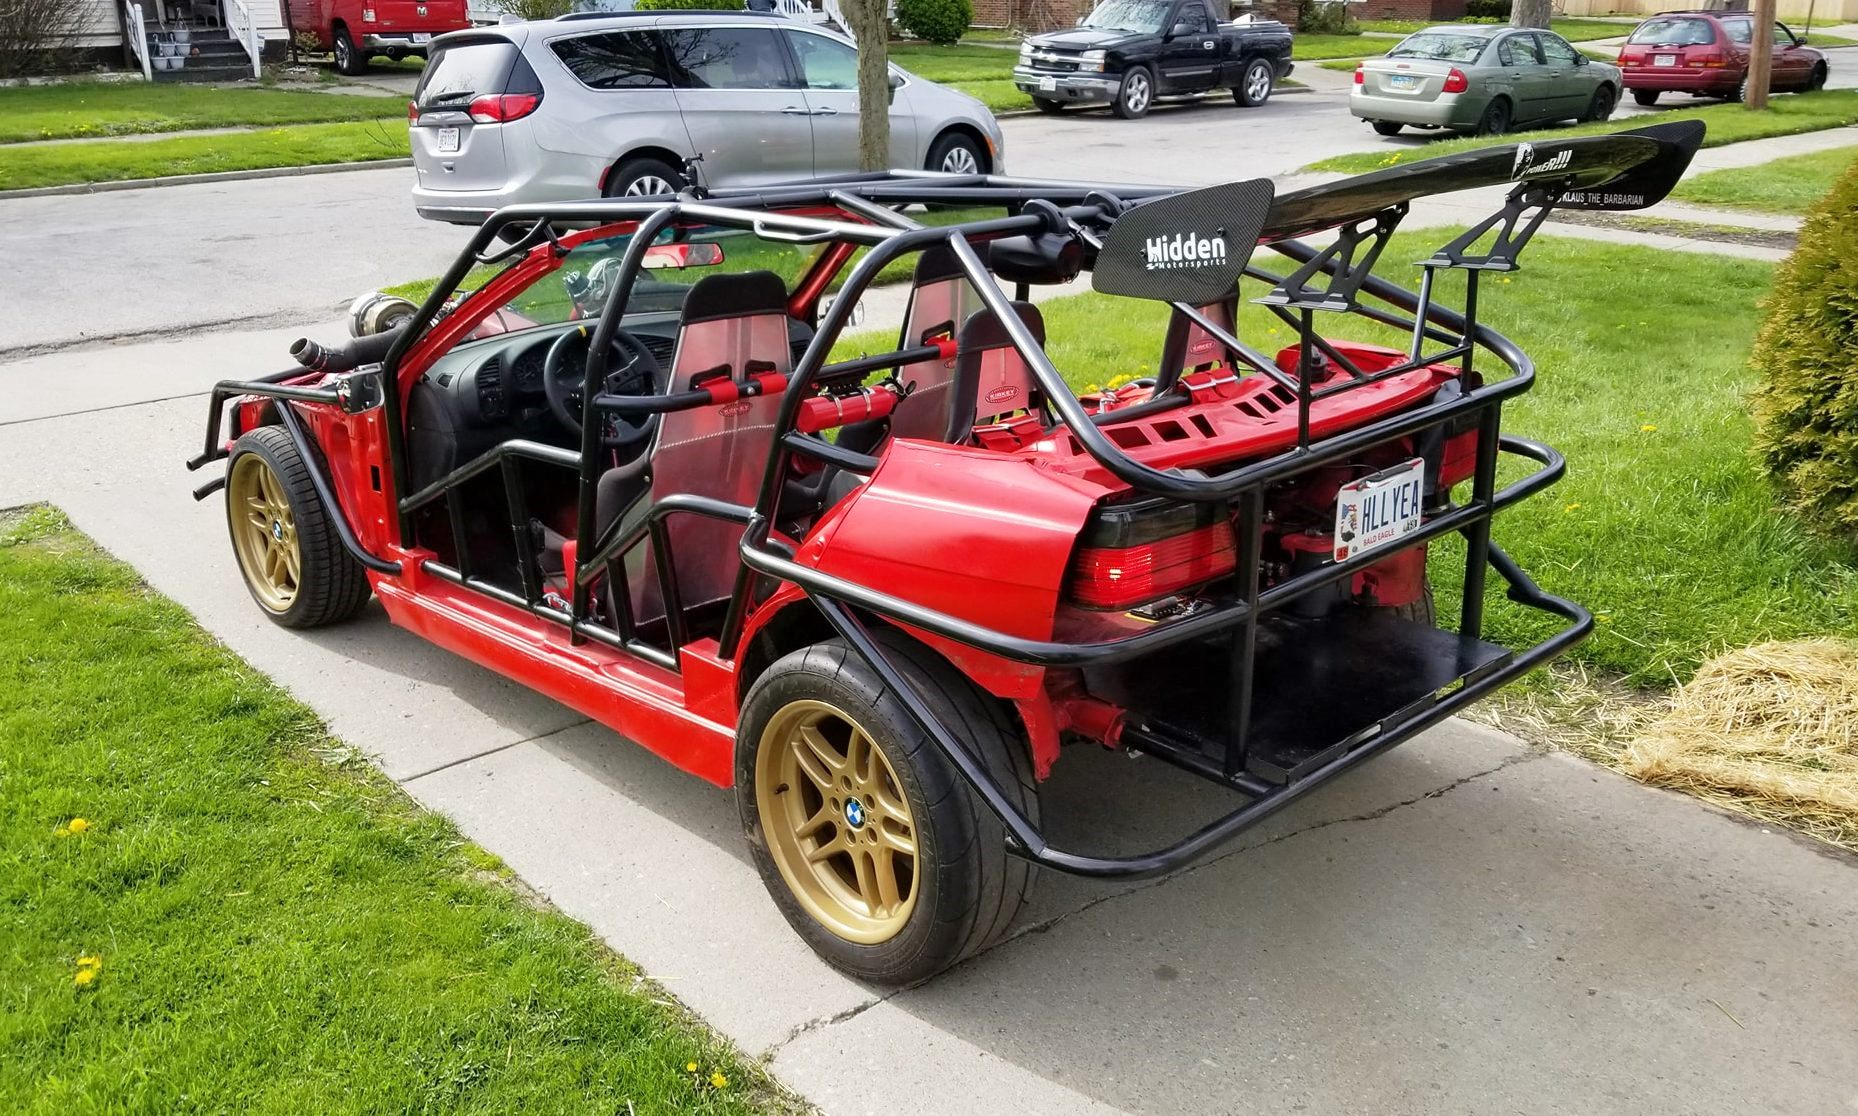 BMW Drift Kart side